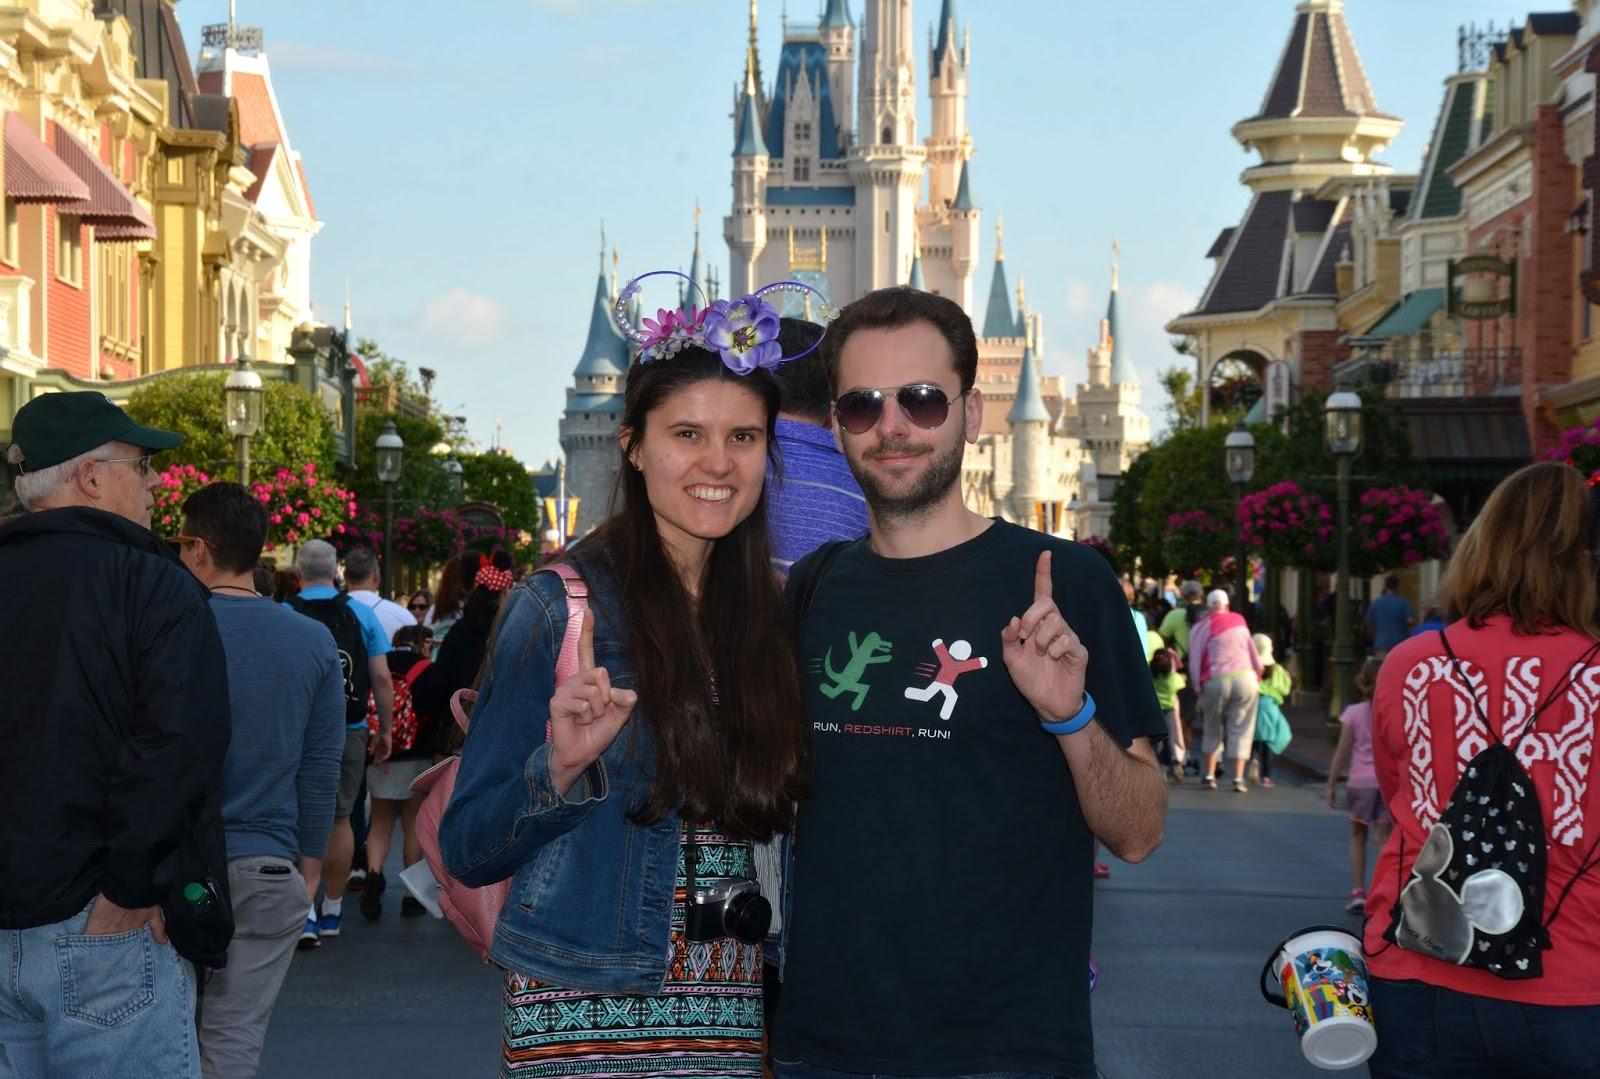 Our first park of the Walt Disney World 4 park challenge: Magic Kingdom